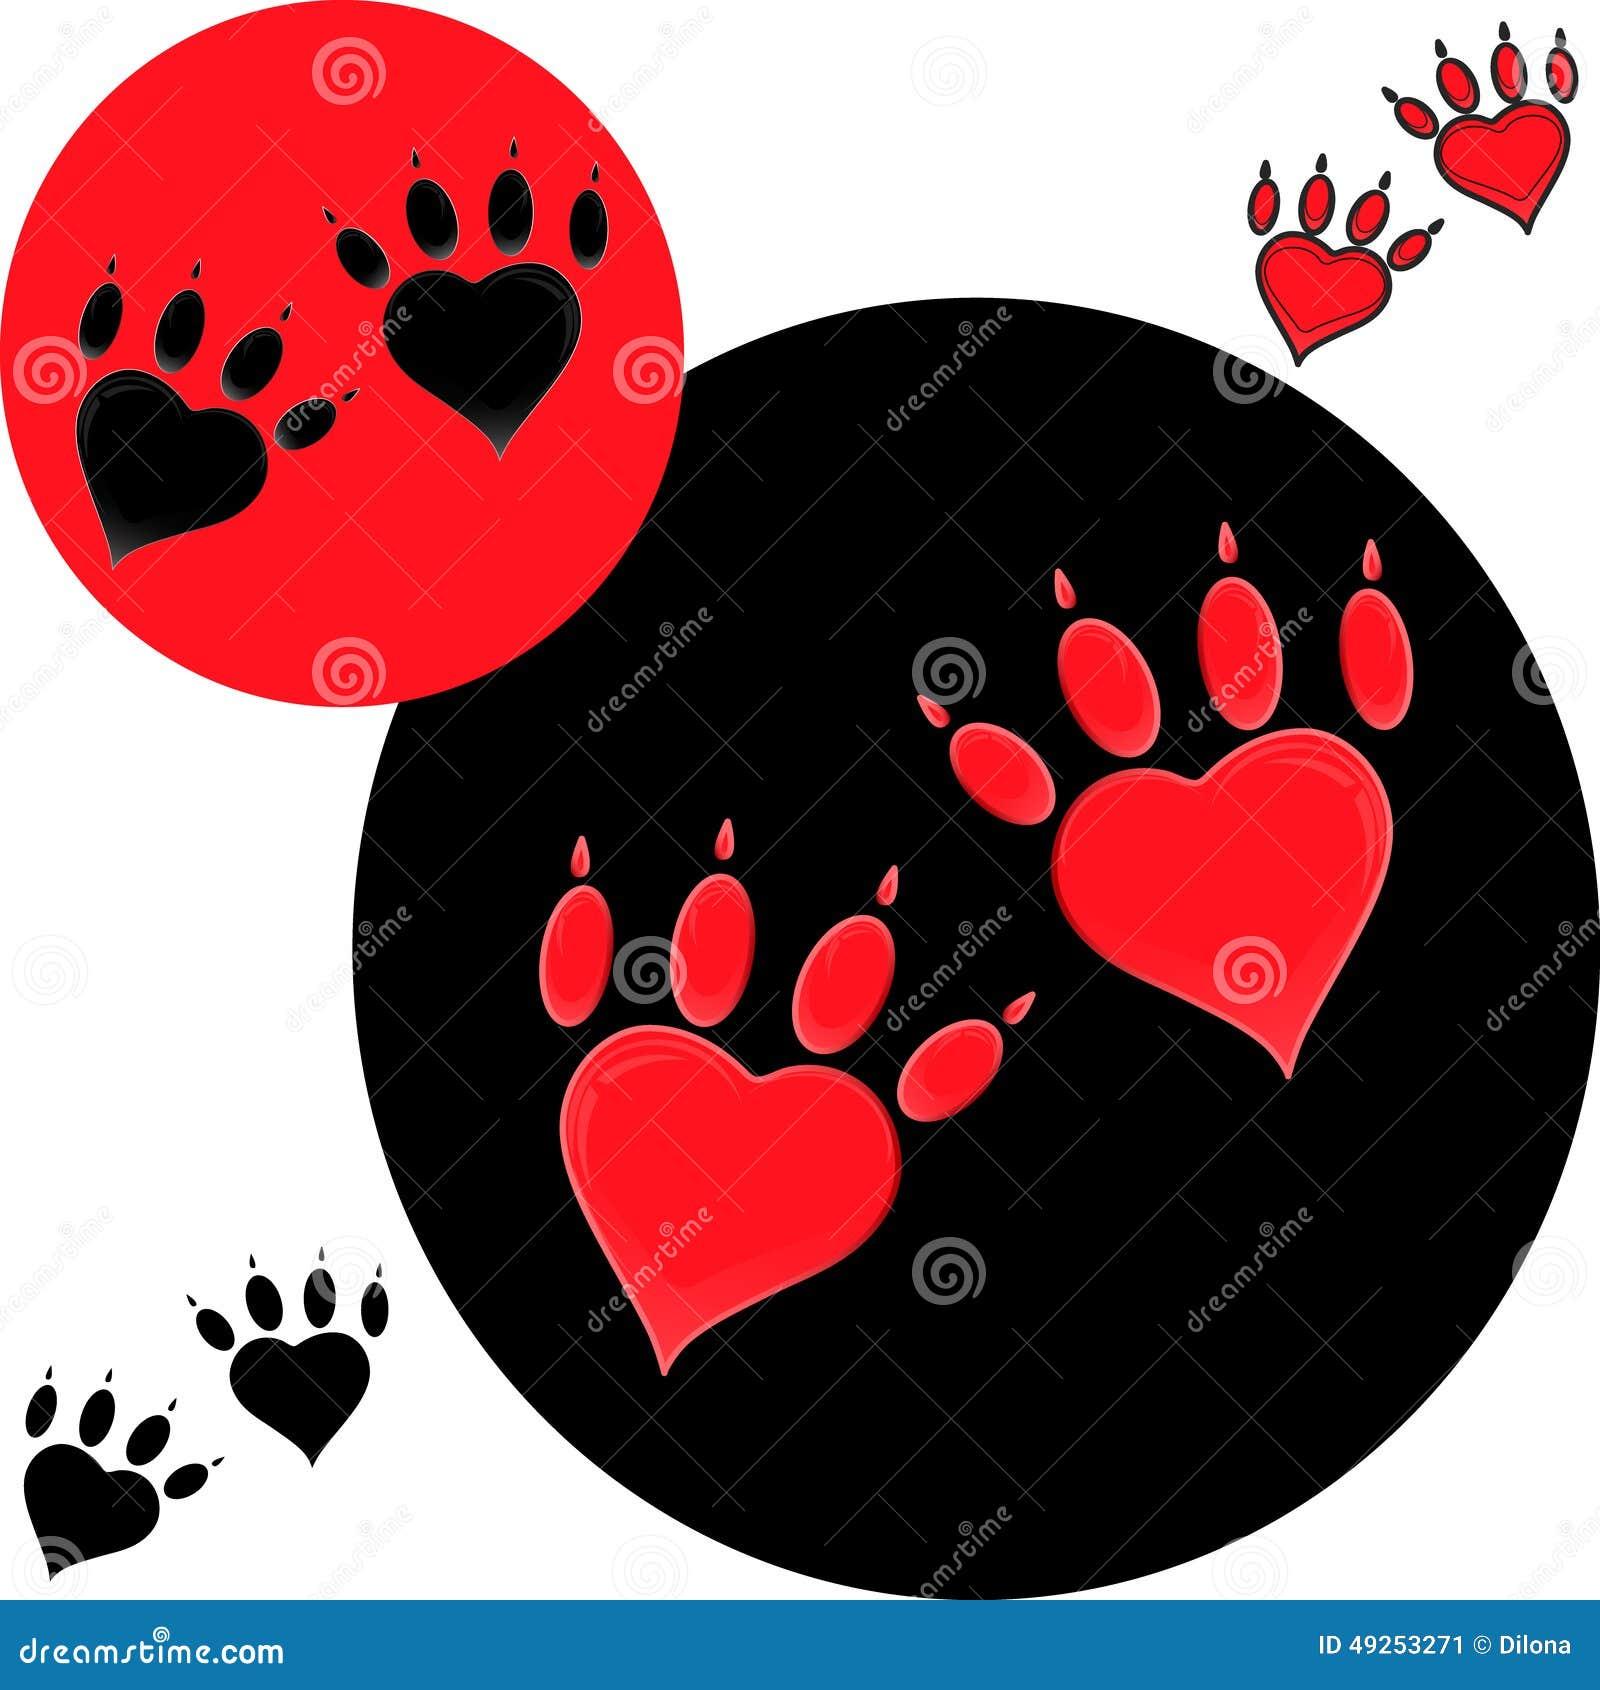 Red dog paw logo - photo#22